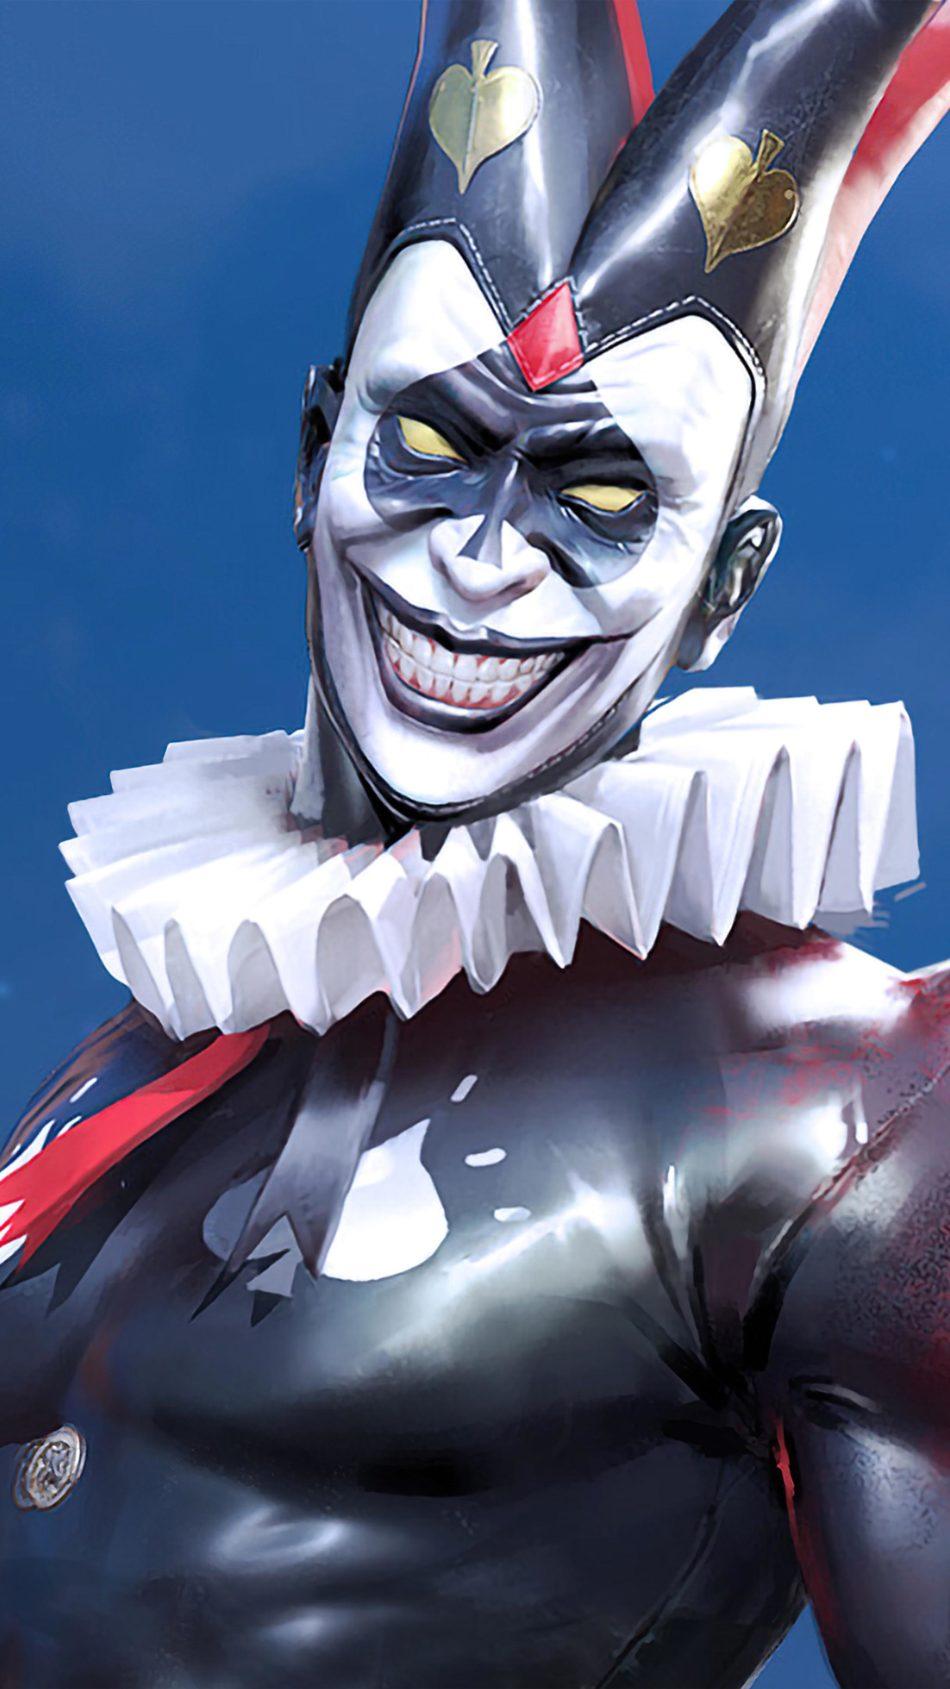 Joker Of Spades Pubg 4k Ultra Hd Mobile Wallpaper